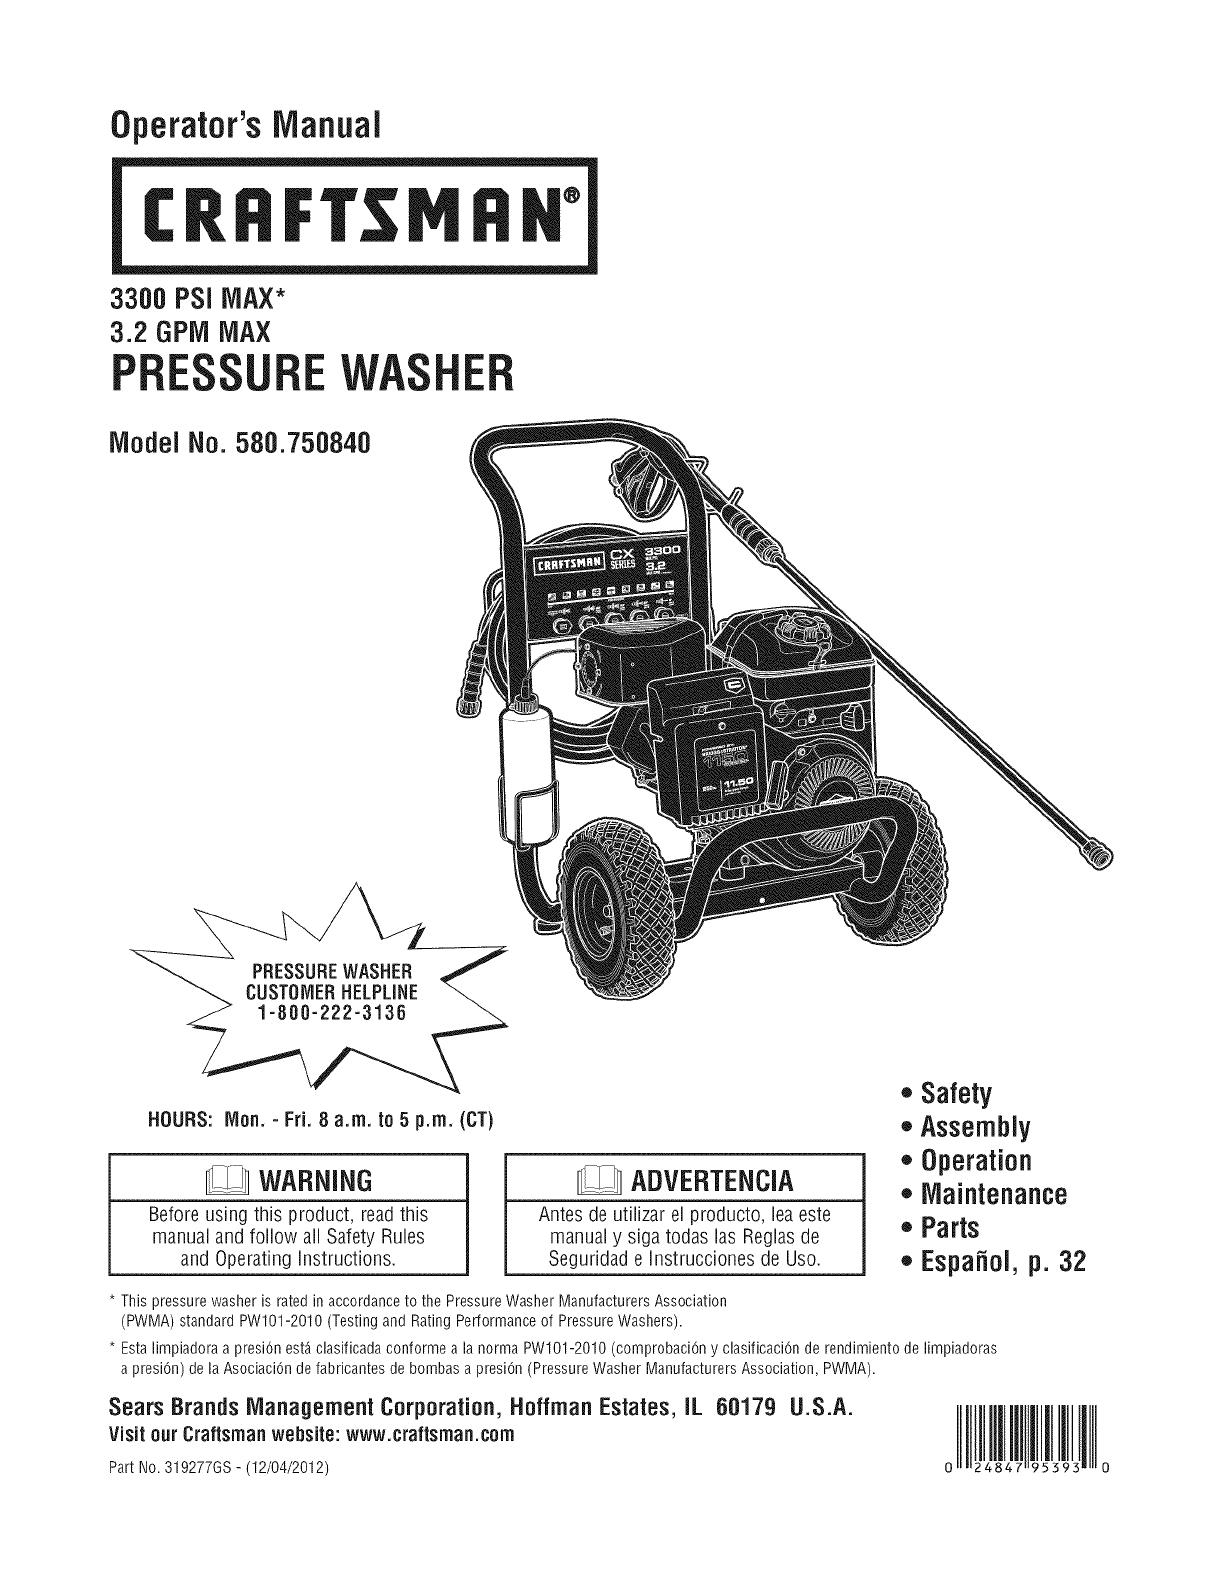 craftsman power washer manual daily instruction manual guides u2022 rh testingwordpress co Craftsman Model 917 Craftsman Repair Manual